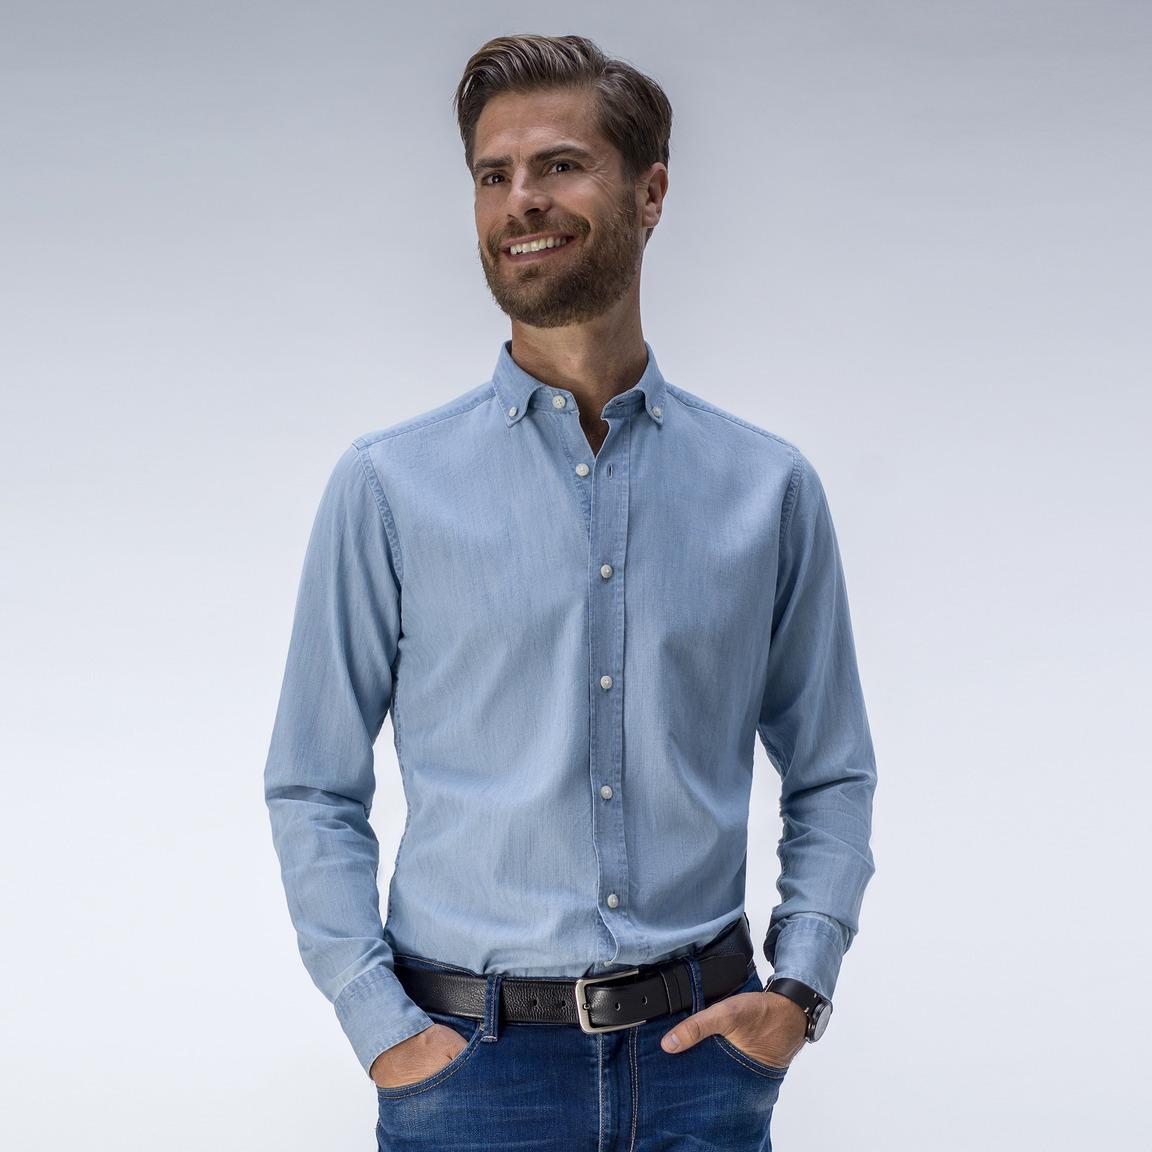 Trendiges blaues Denim-Hemd